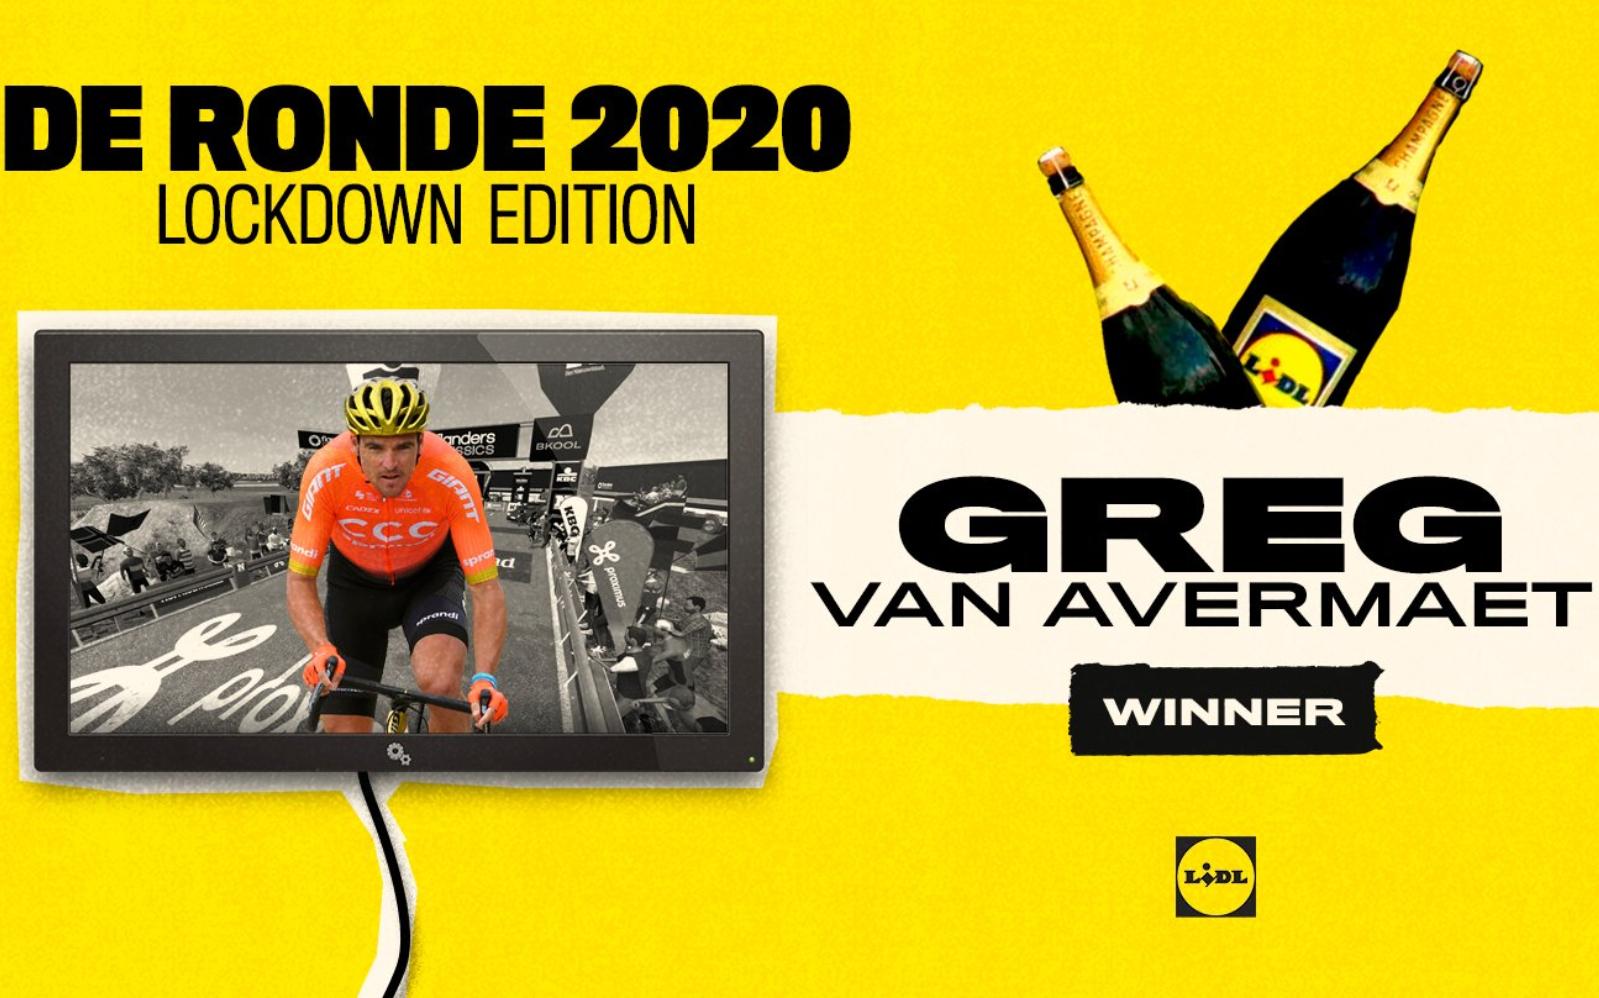 Greg Van Avermaet, ganador virtual del Tour de Flandes 2020